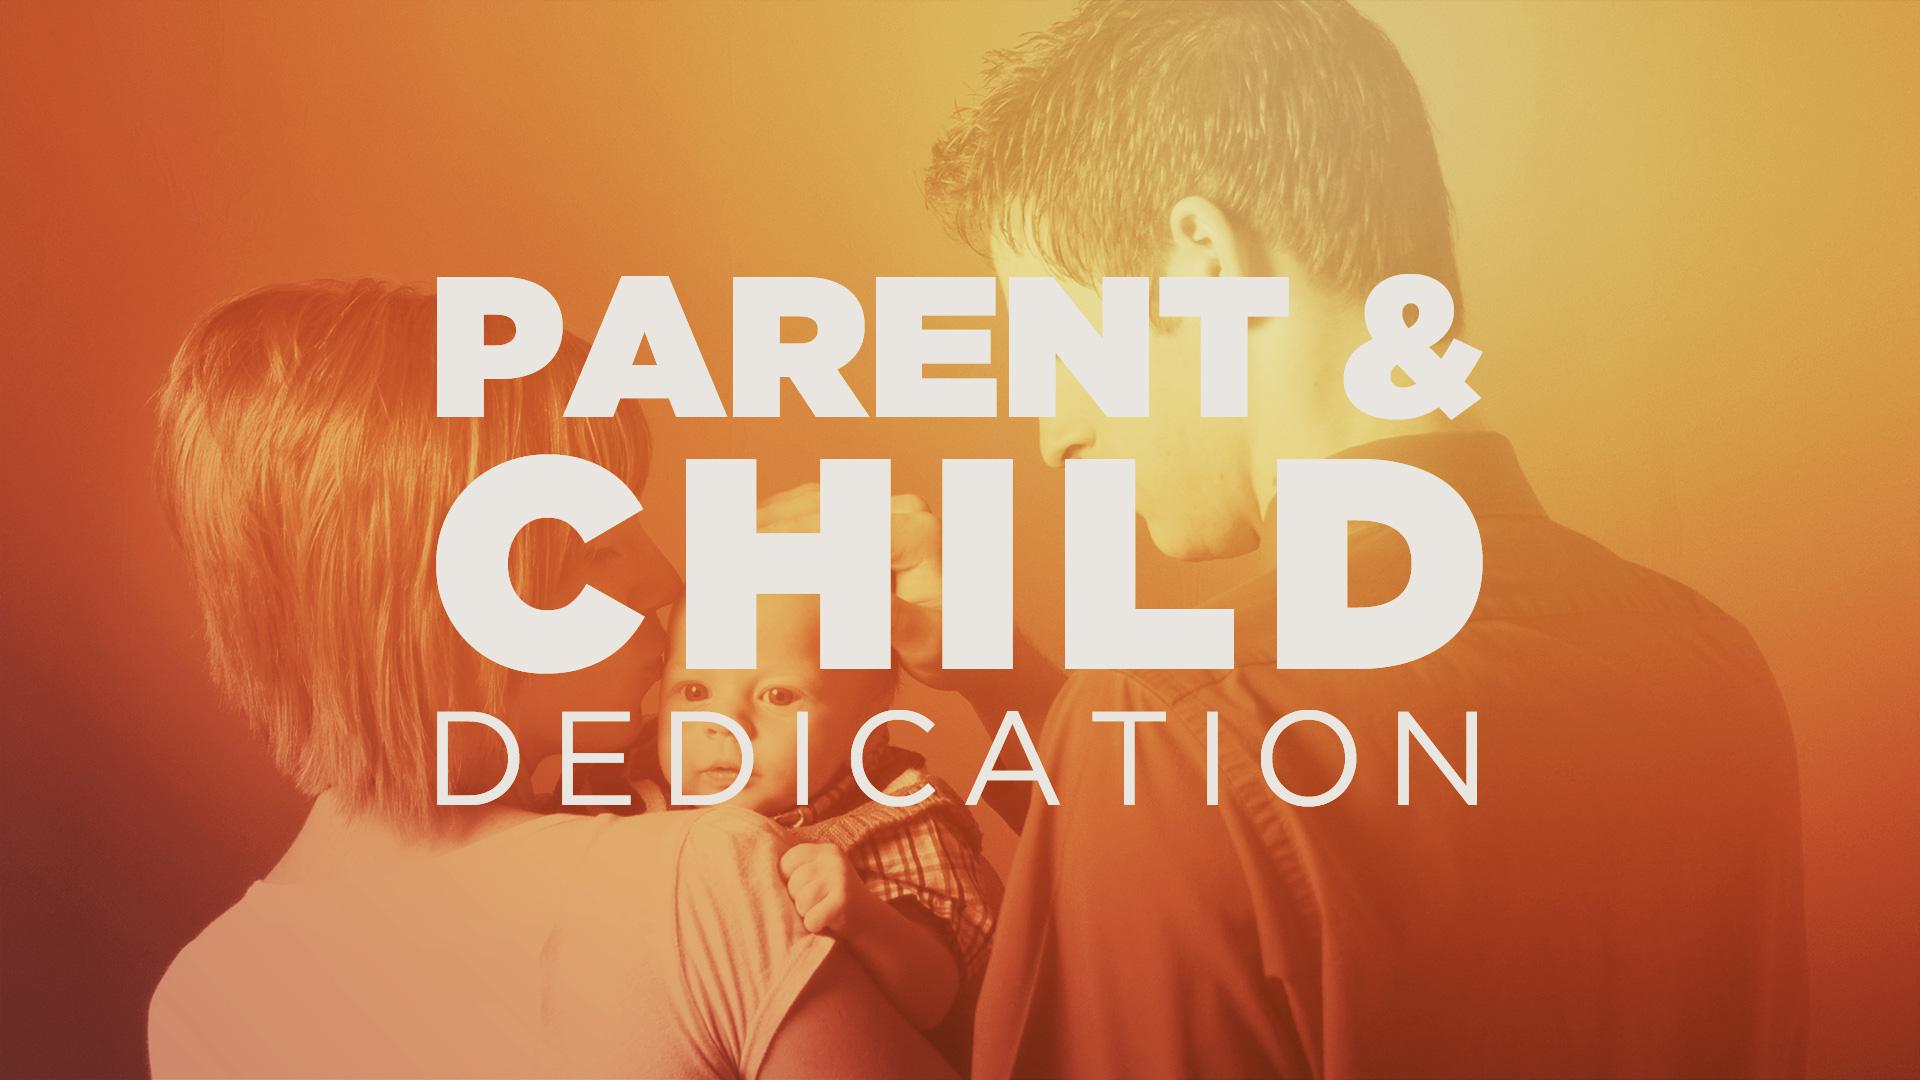 Image: Parent/Child Dedication